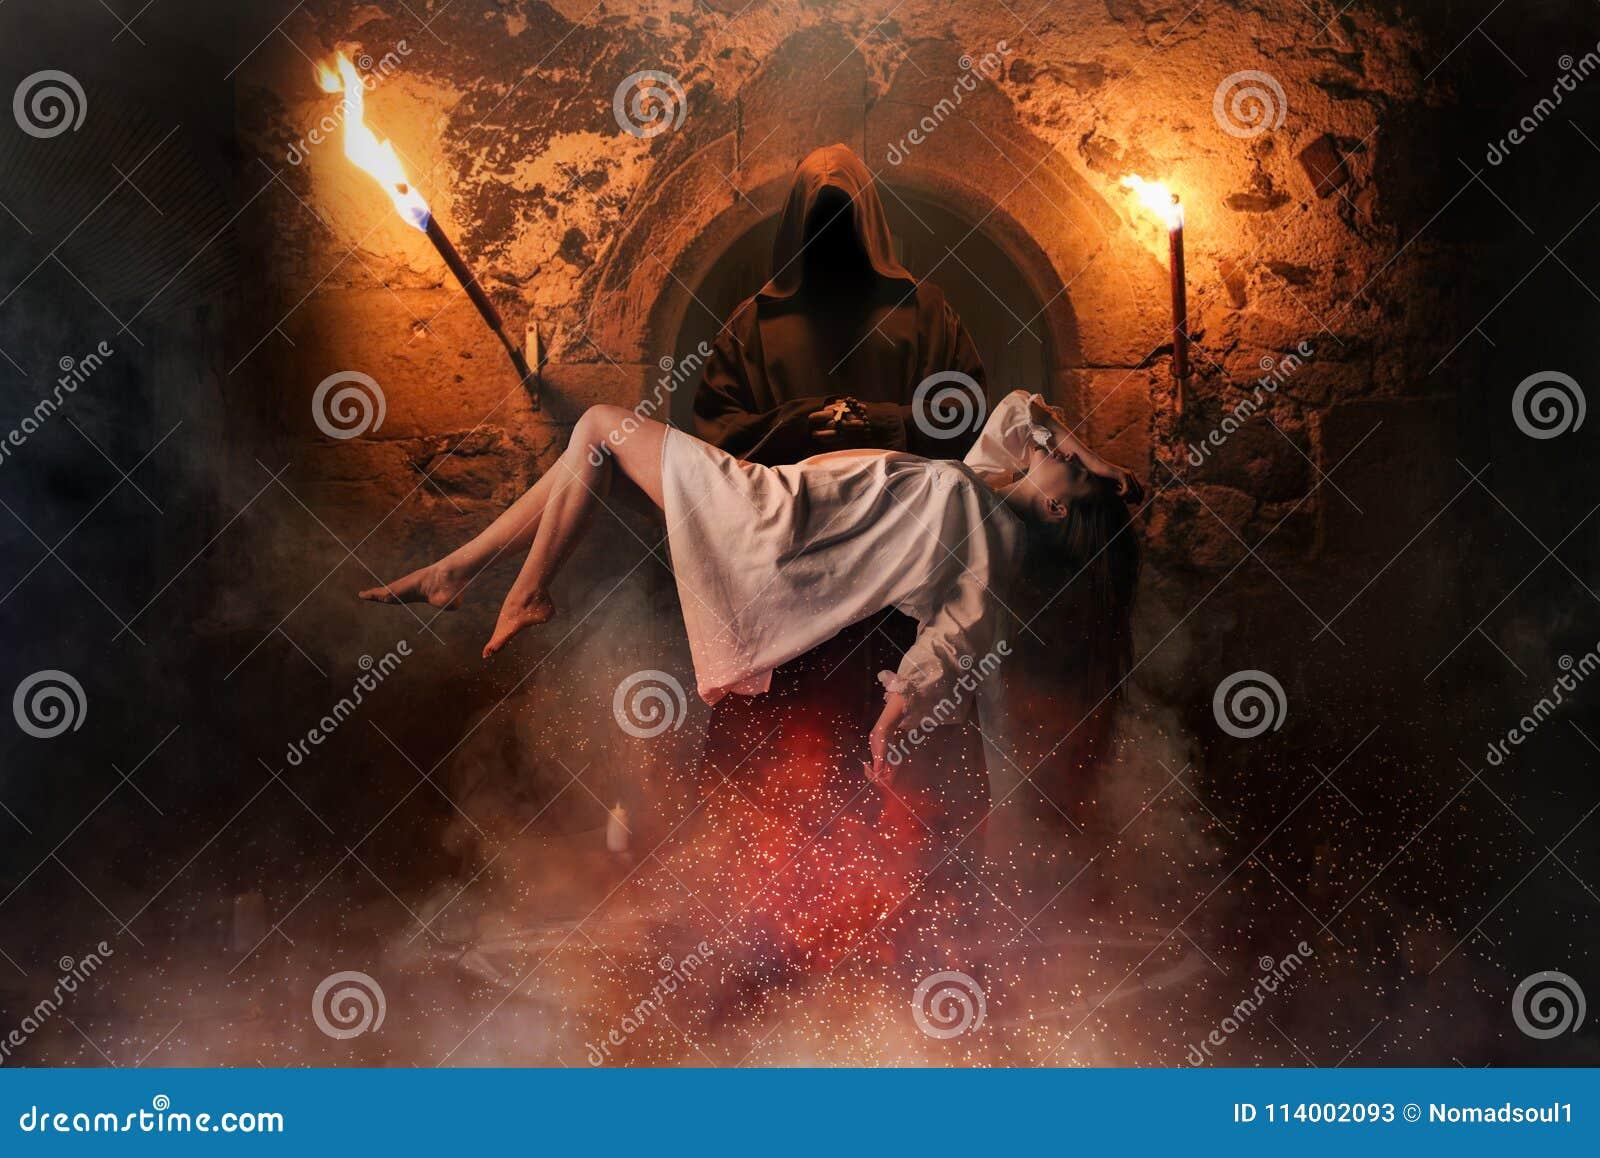 Man against woman flying over pentagram circle